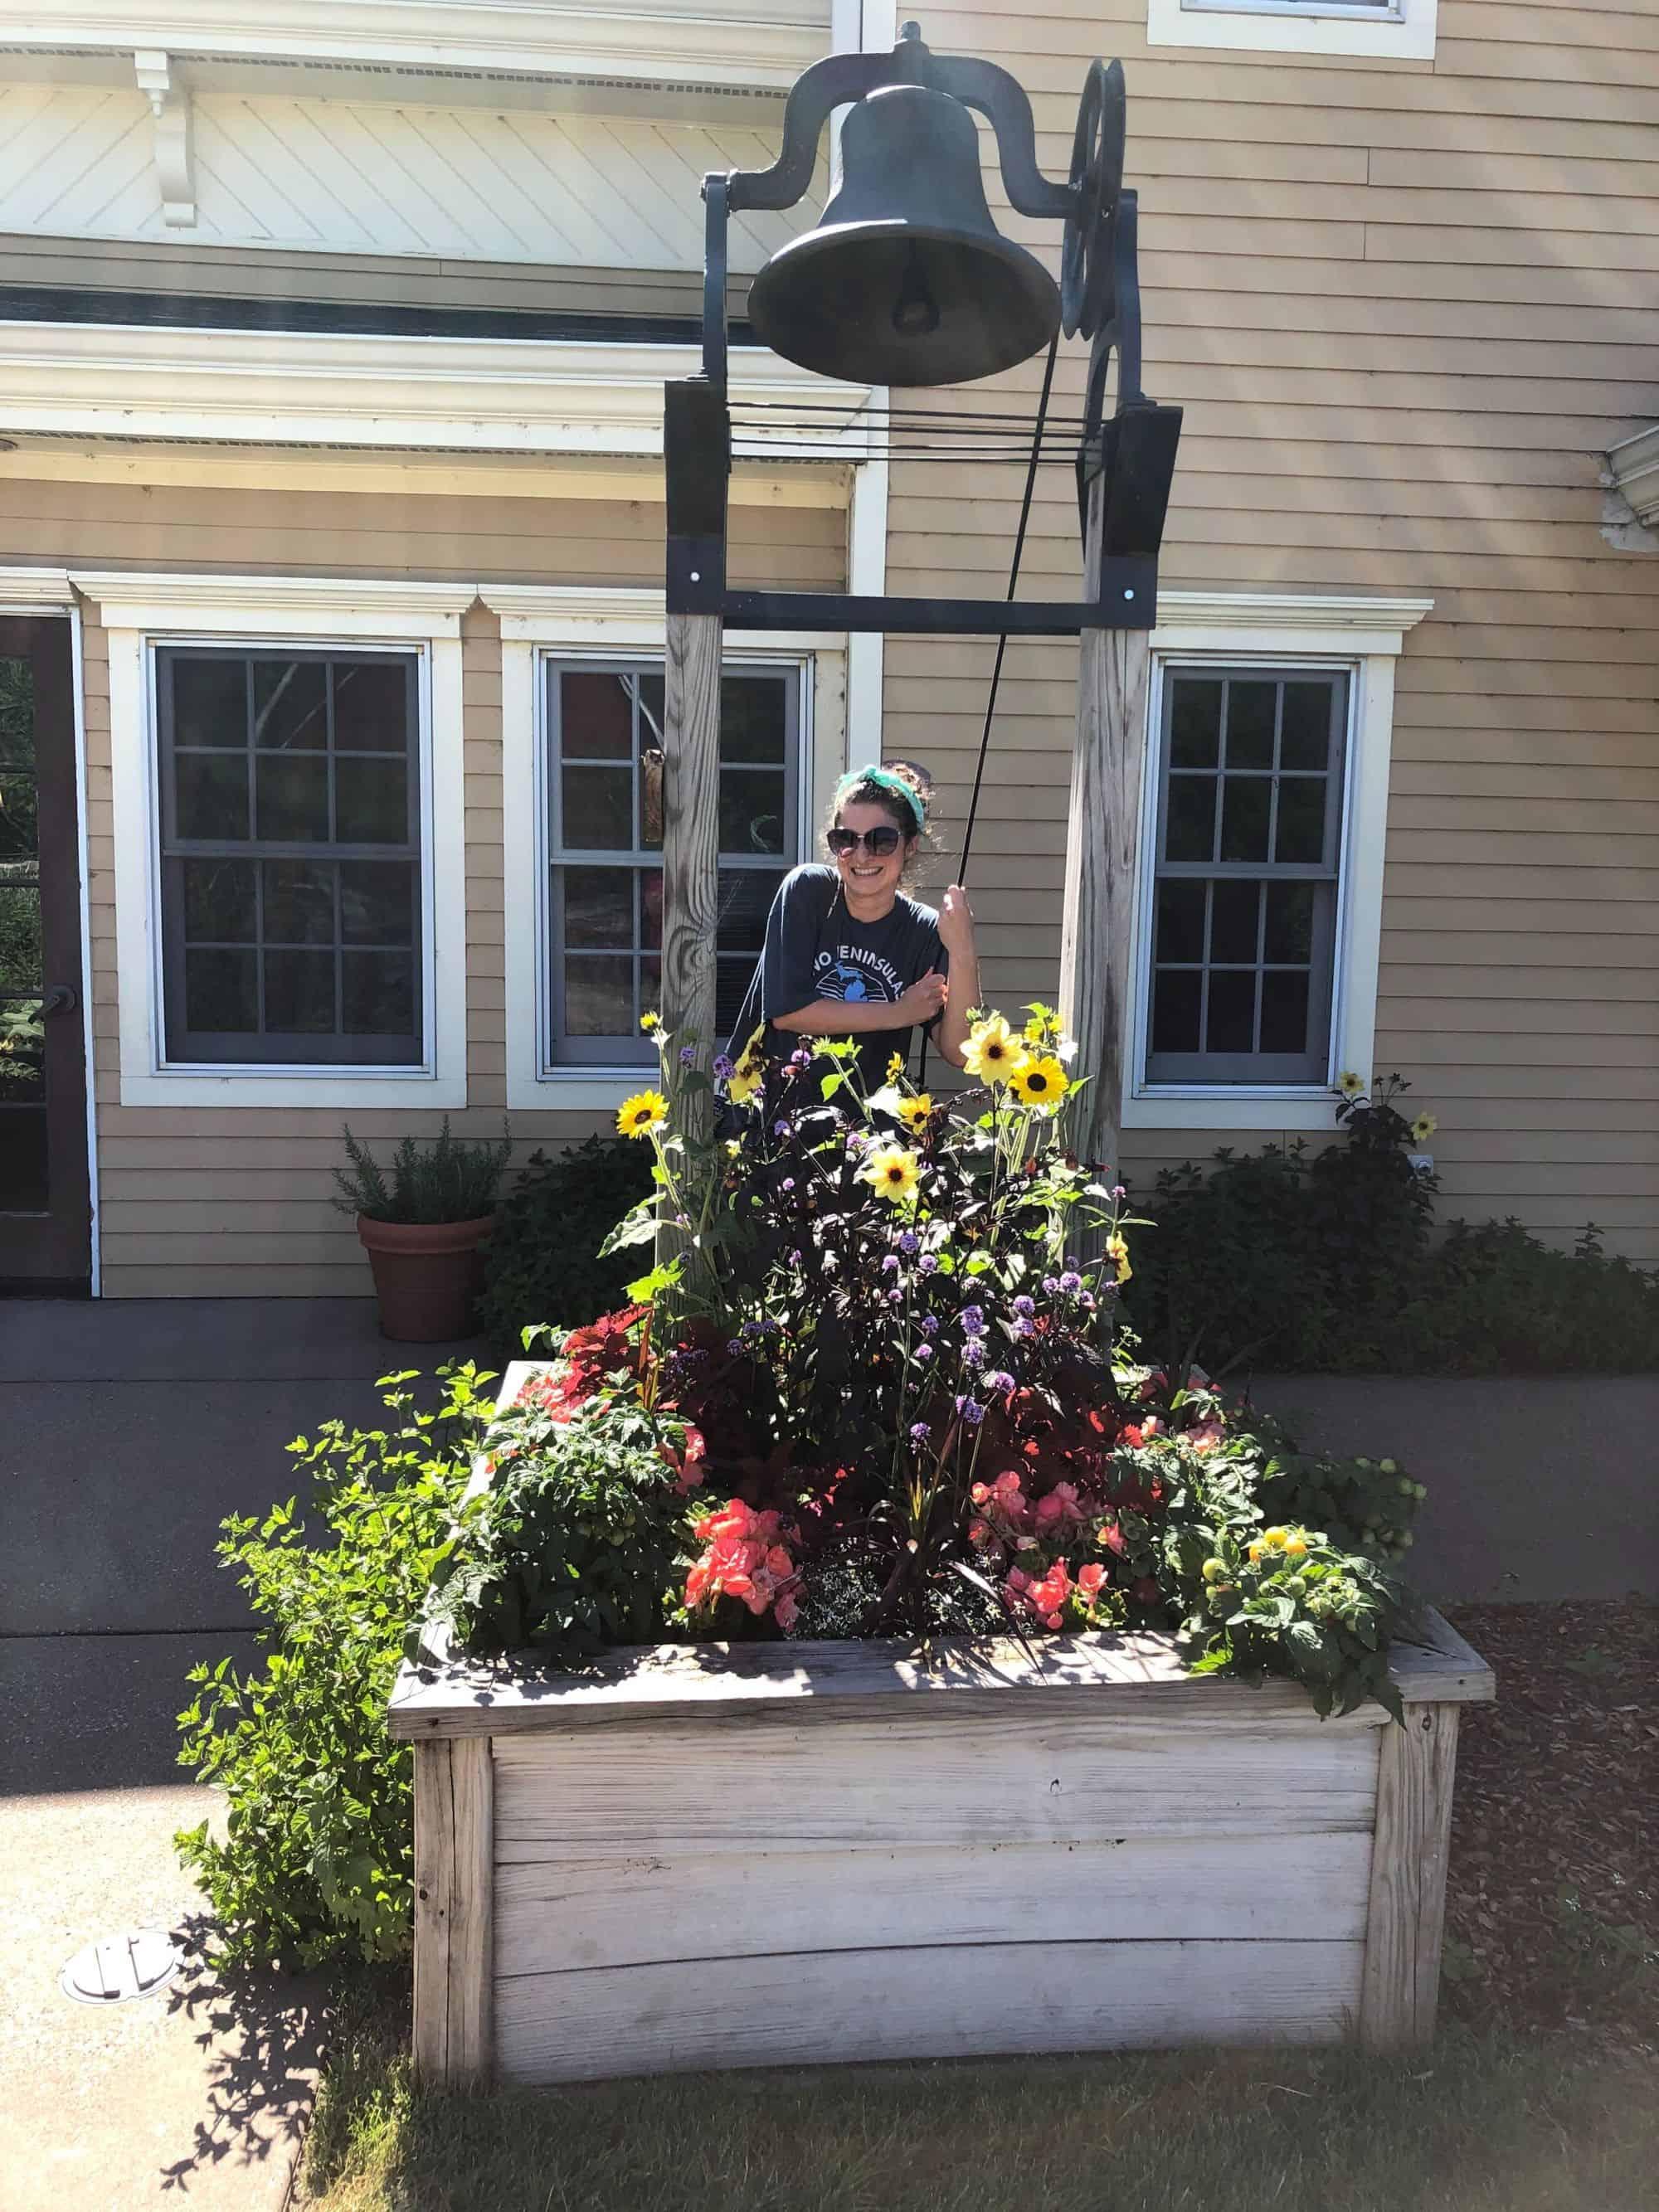 A photo of Chiara in her backyard